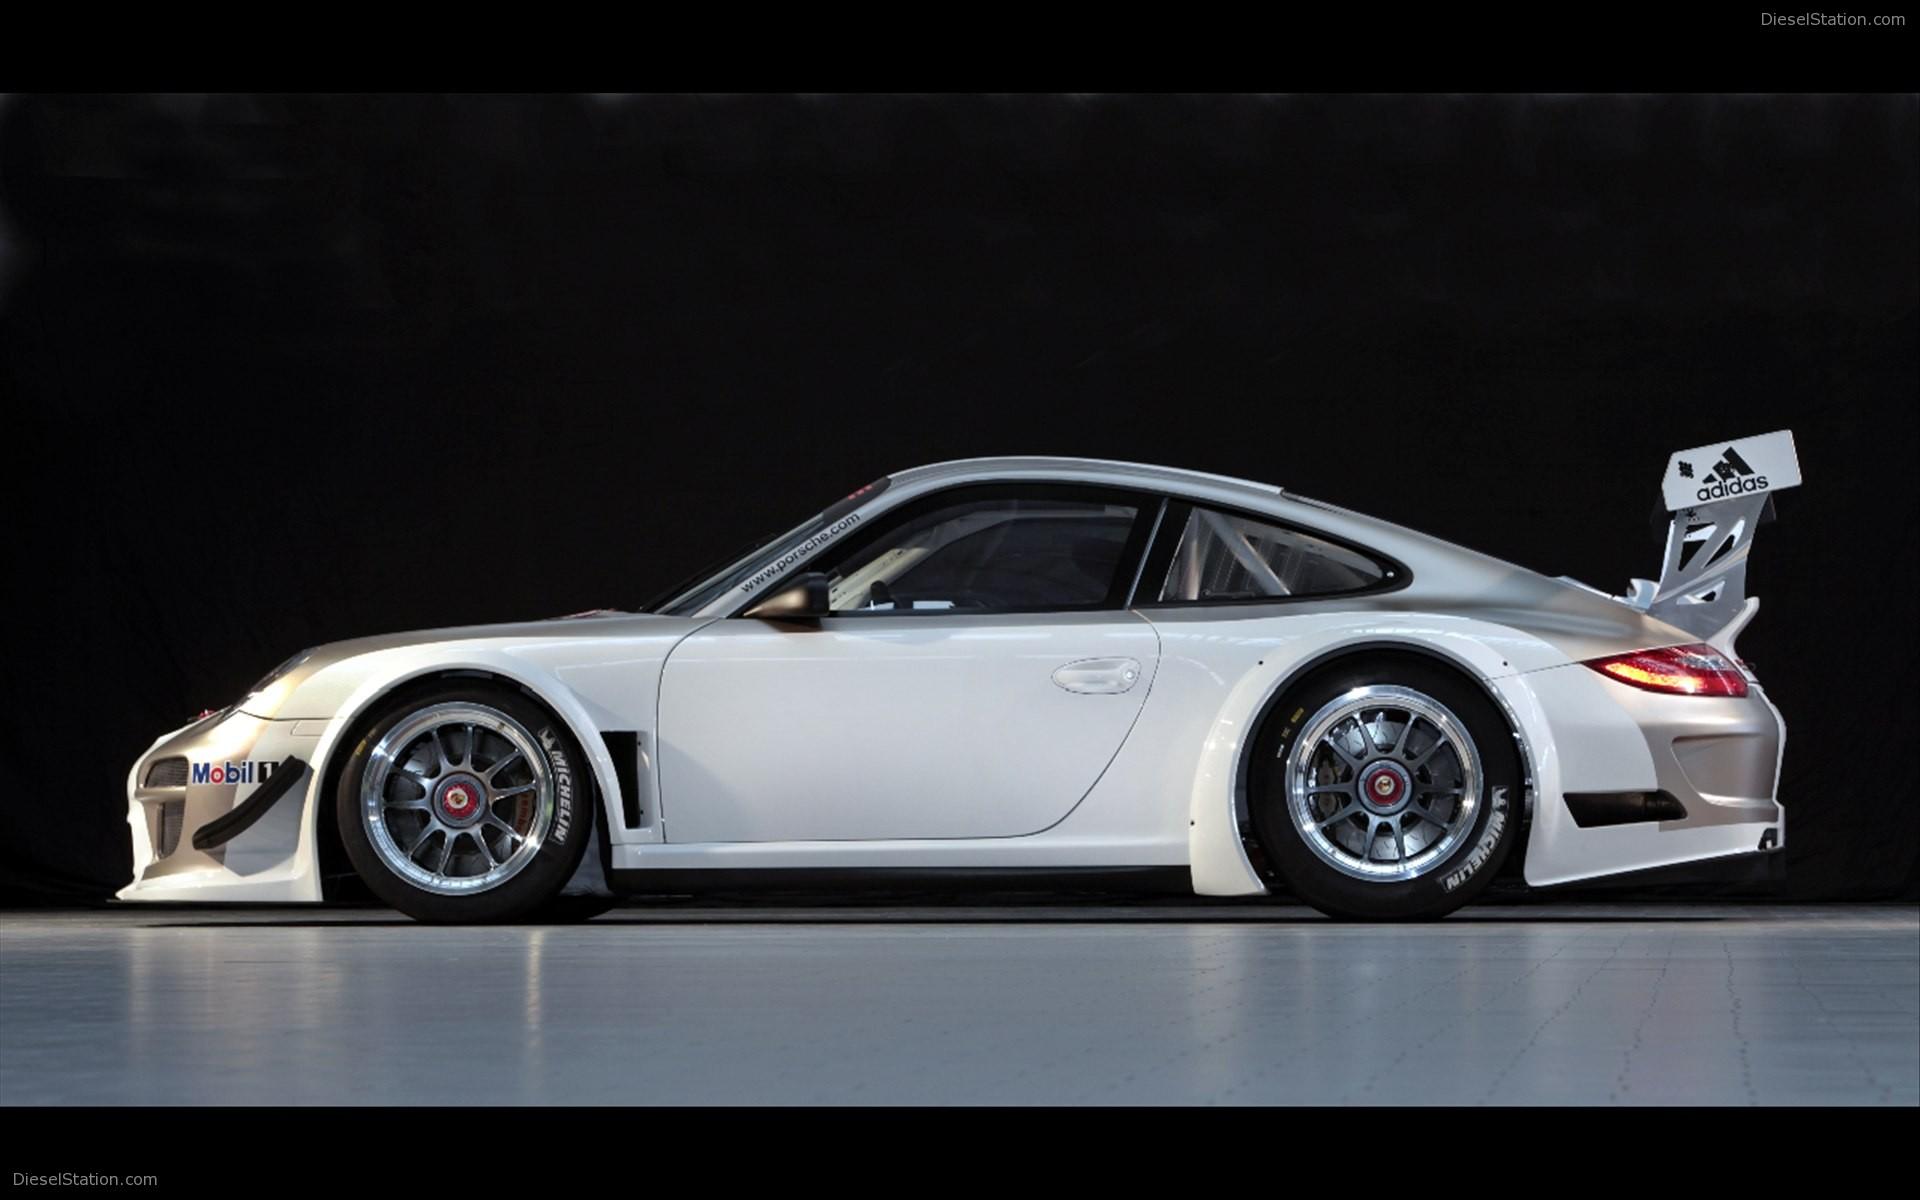 Home Porsche Porsche 911 GT3 R 2012 1920x1200